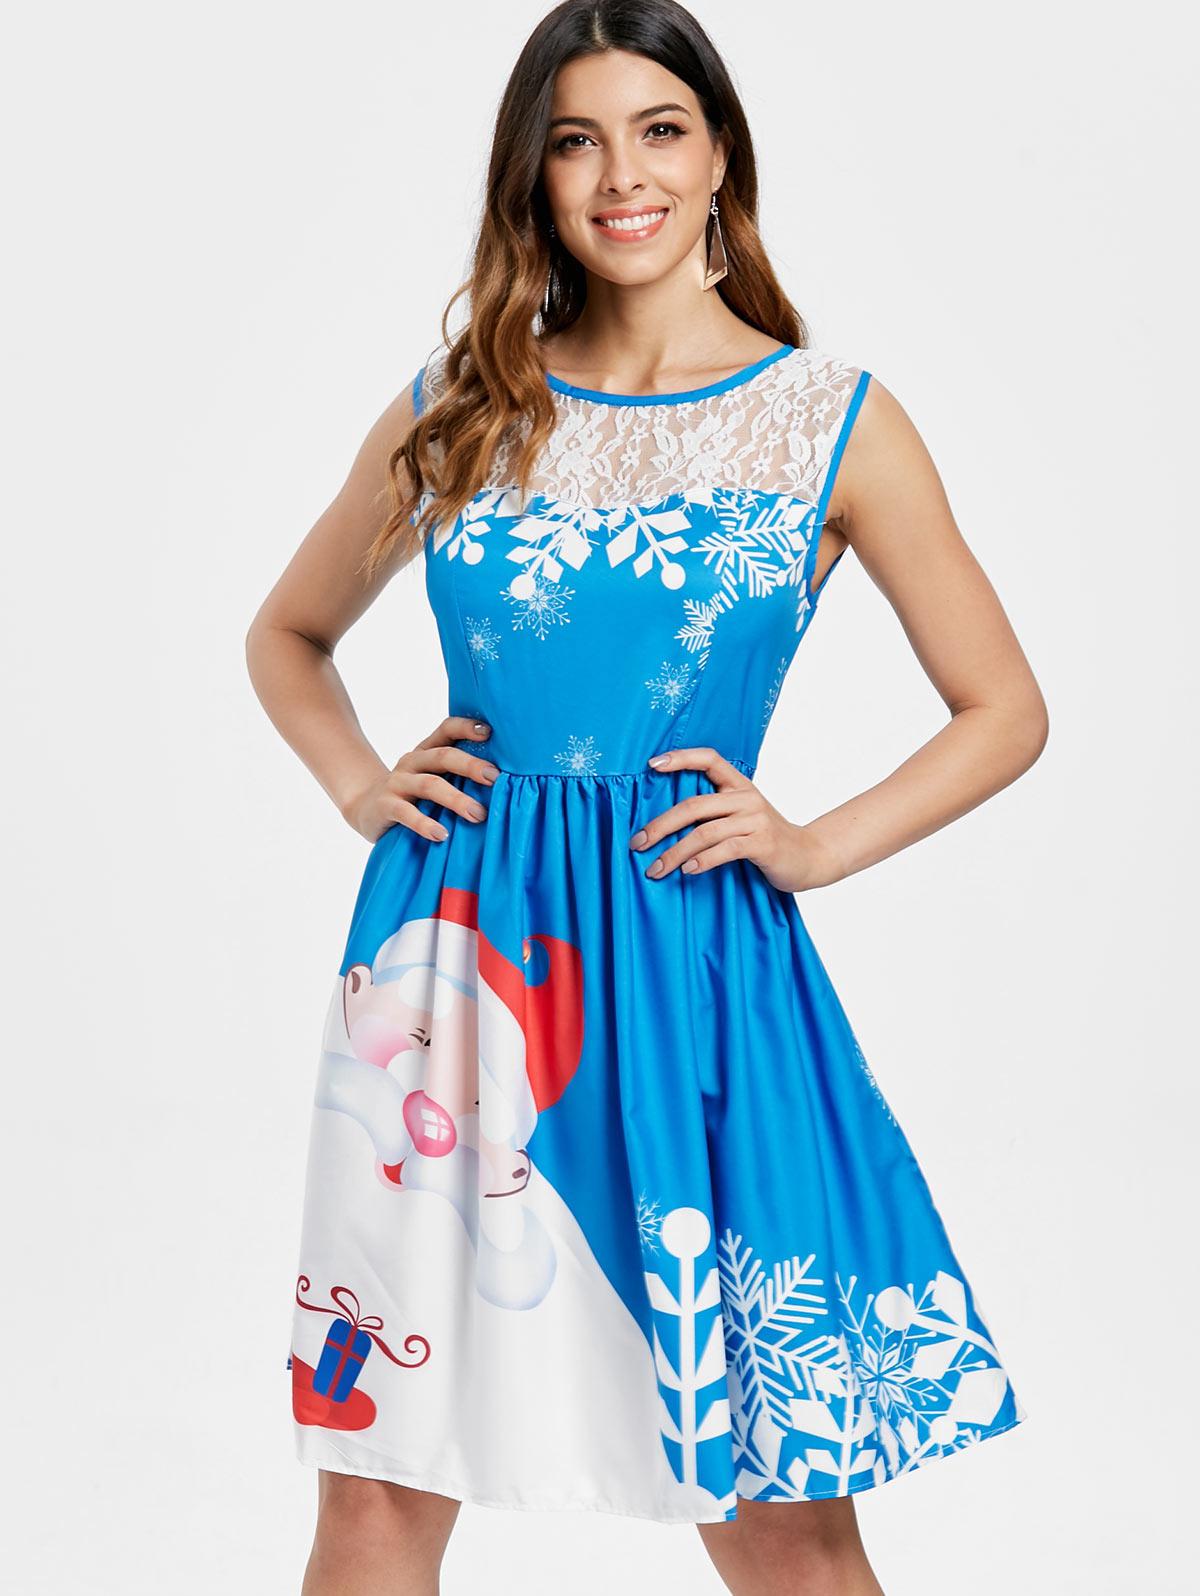 ed6312e46710 Kenancy Christmas Lace Insert Santa Claus Print Party Dress Women Vintage  Dress Cheap Clothings Clearance Sales